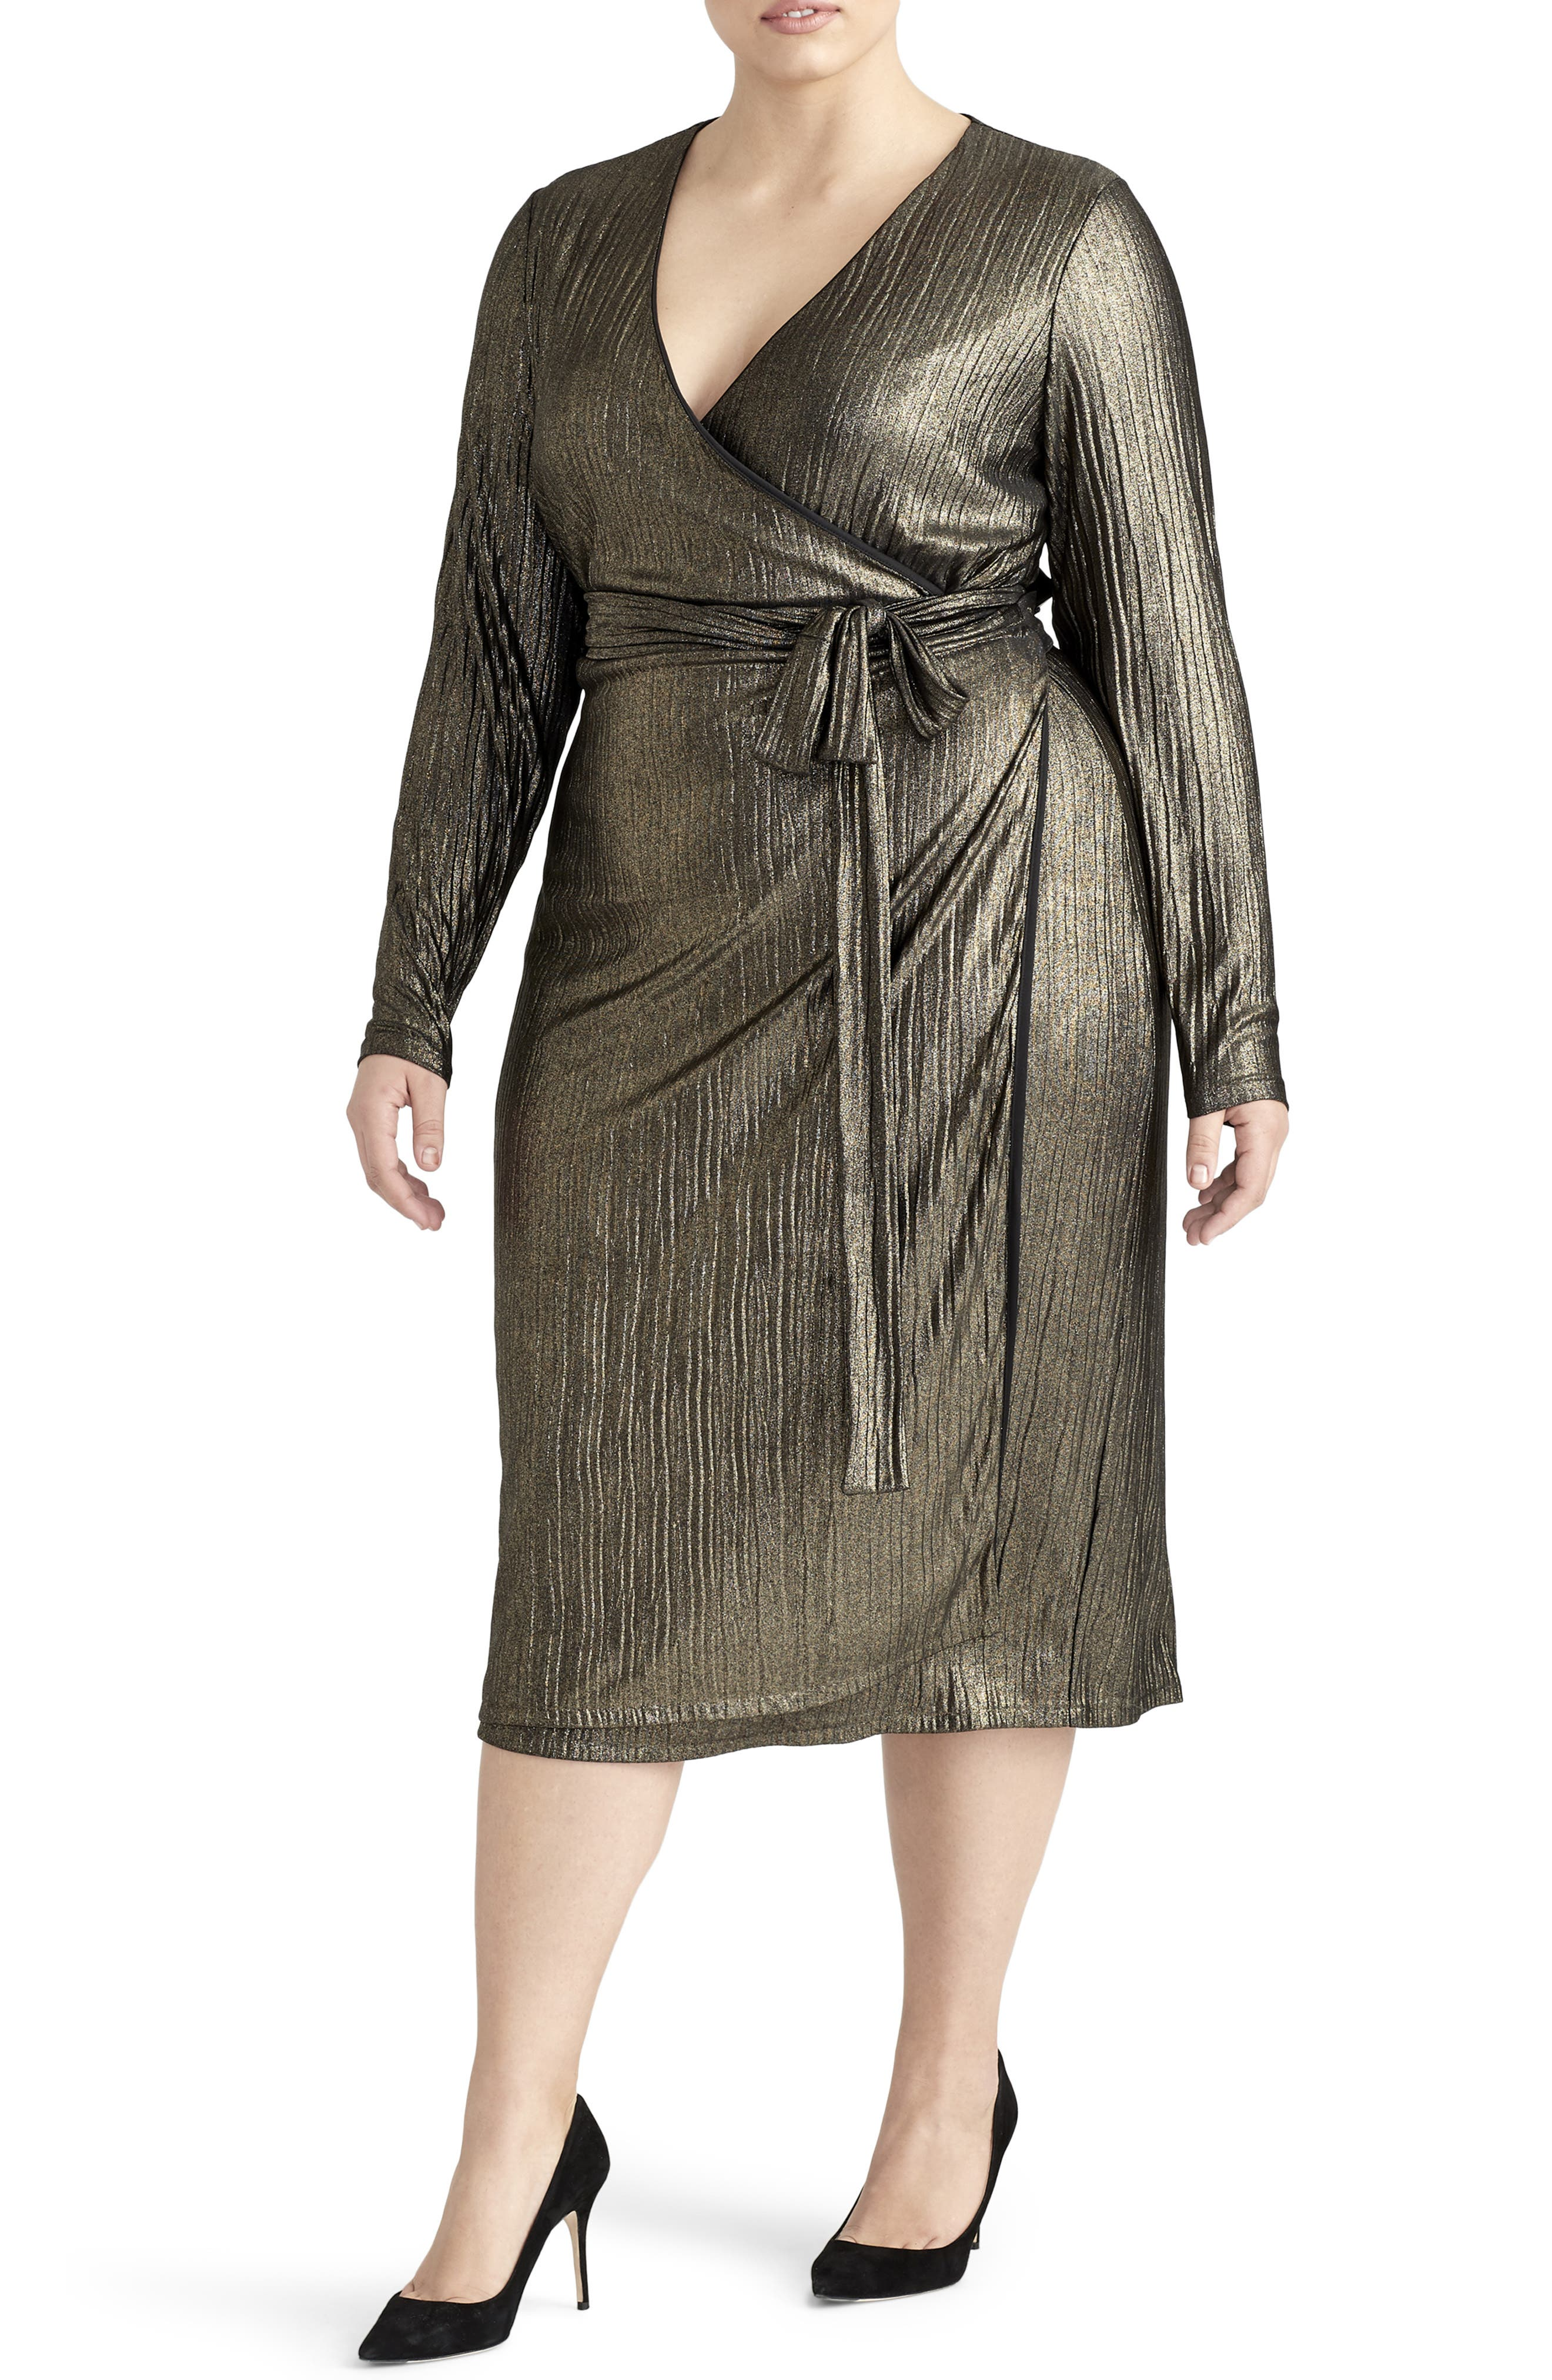 Plus Size Rachel Roy Collection Pleated Metallic Wrap Dress